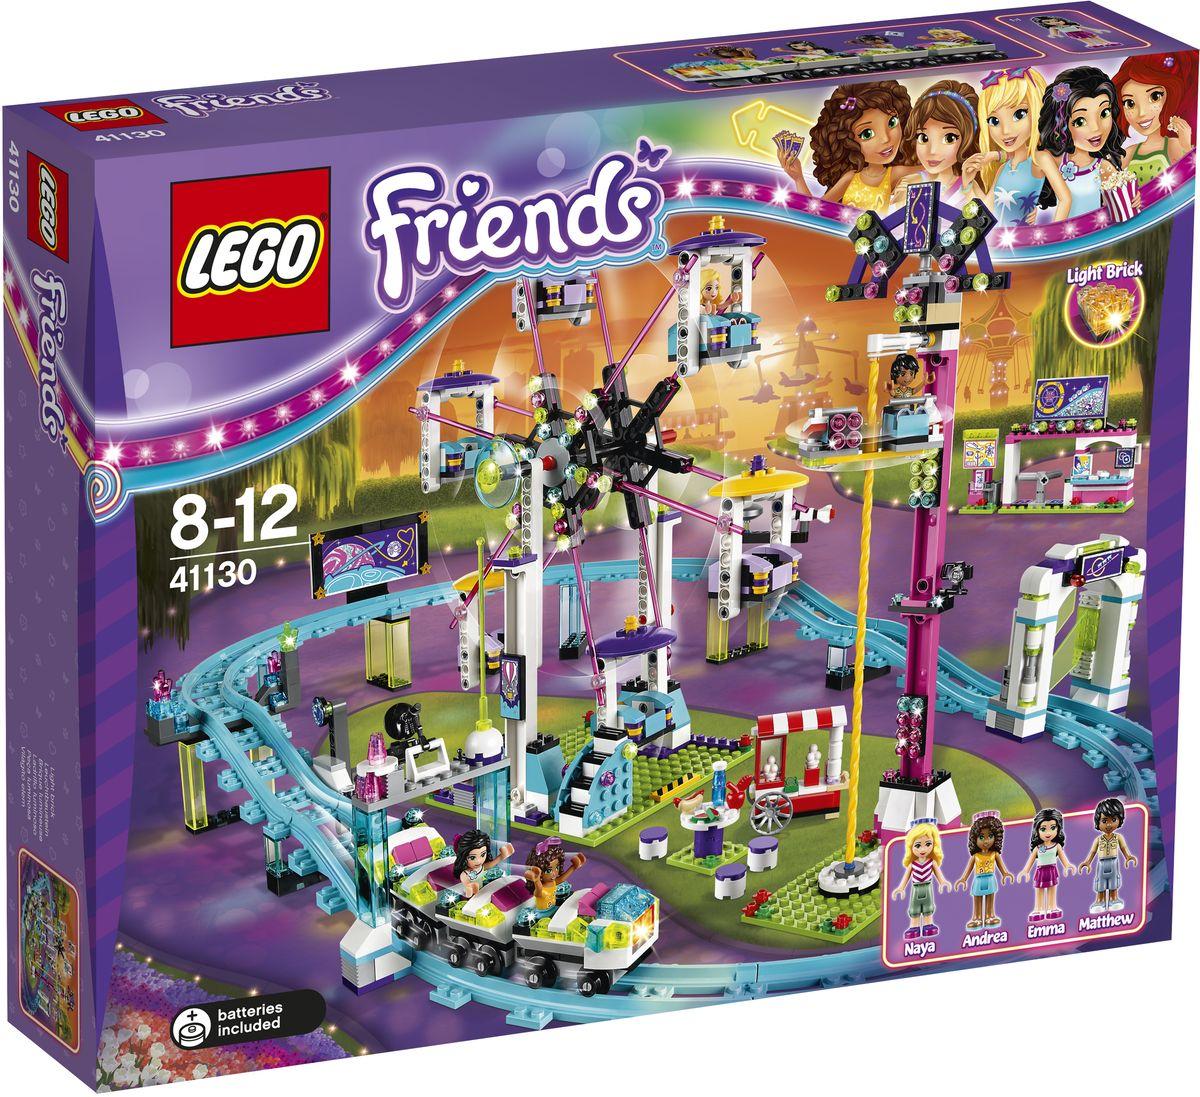 LEGO Friends Конструктор Парк развлечений Американские горки 41130 конструктор lego friends 41128 парк развлечений космическое путешествие